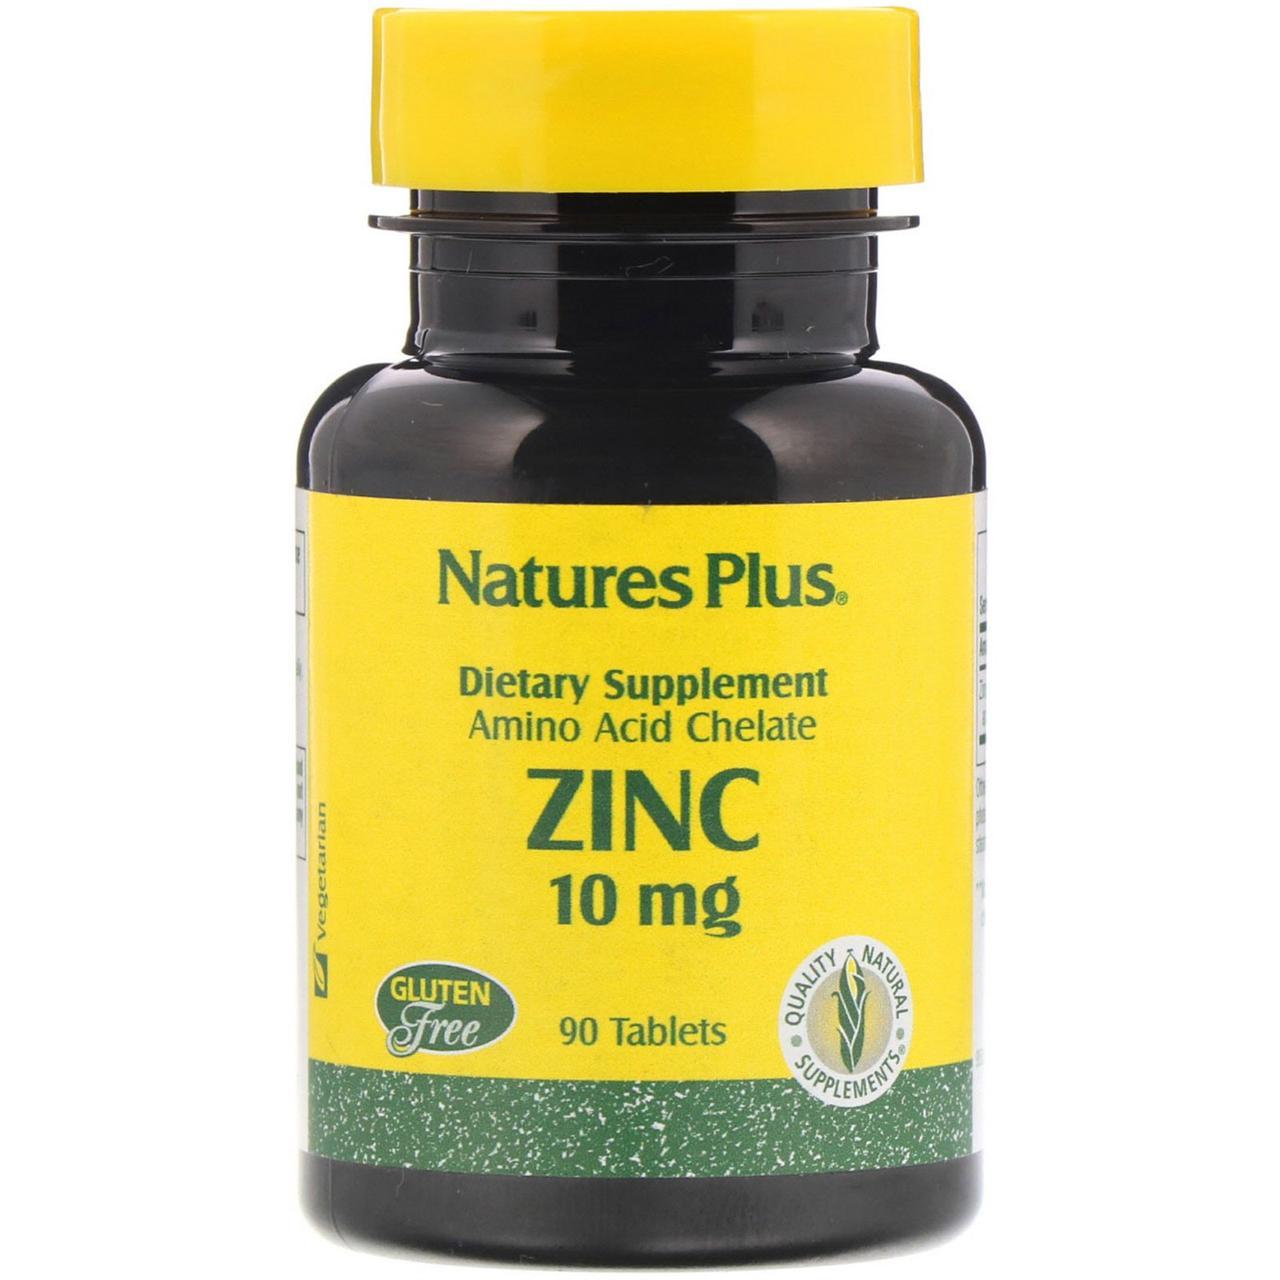 Цинк Nature's Plus (хелат цинка), 10 мг, 90 таблеток